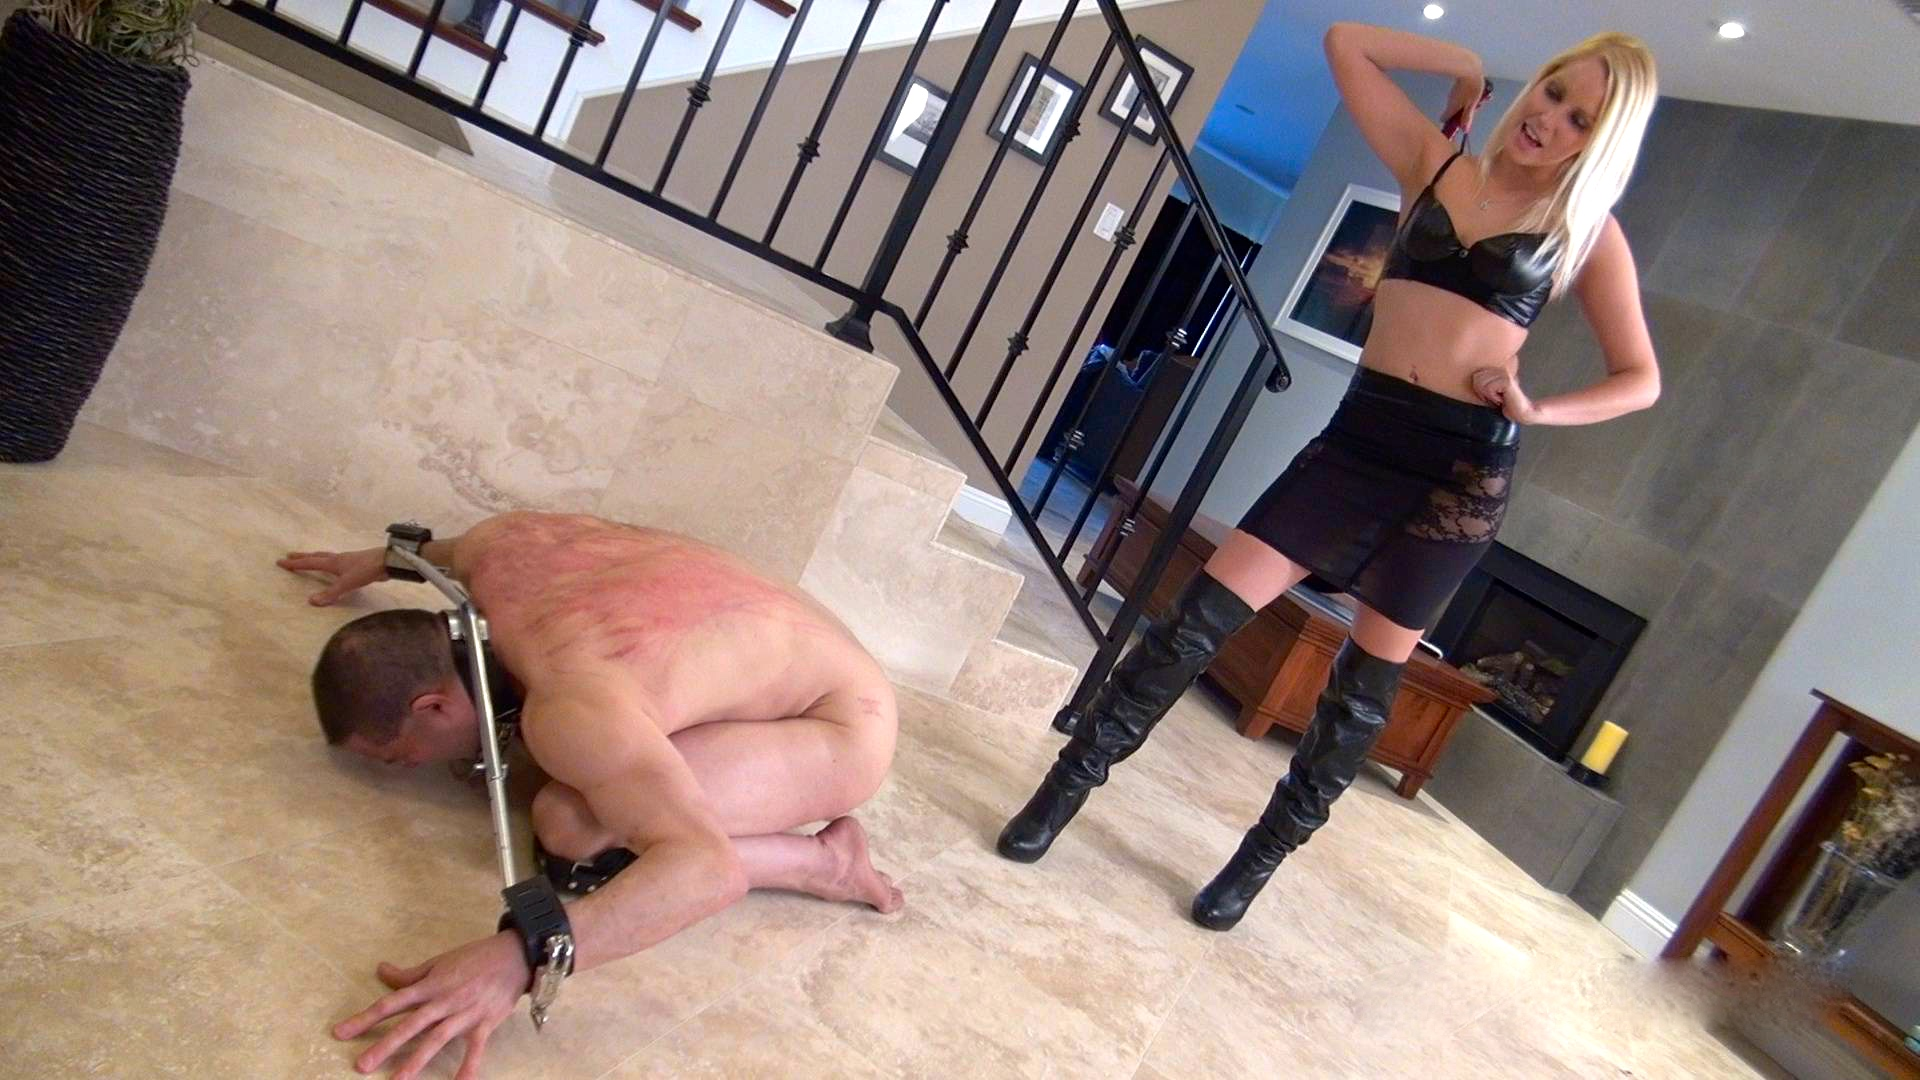 dominación femenina arnés